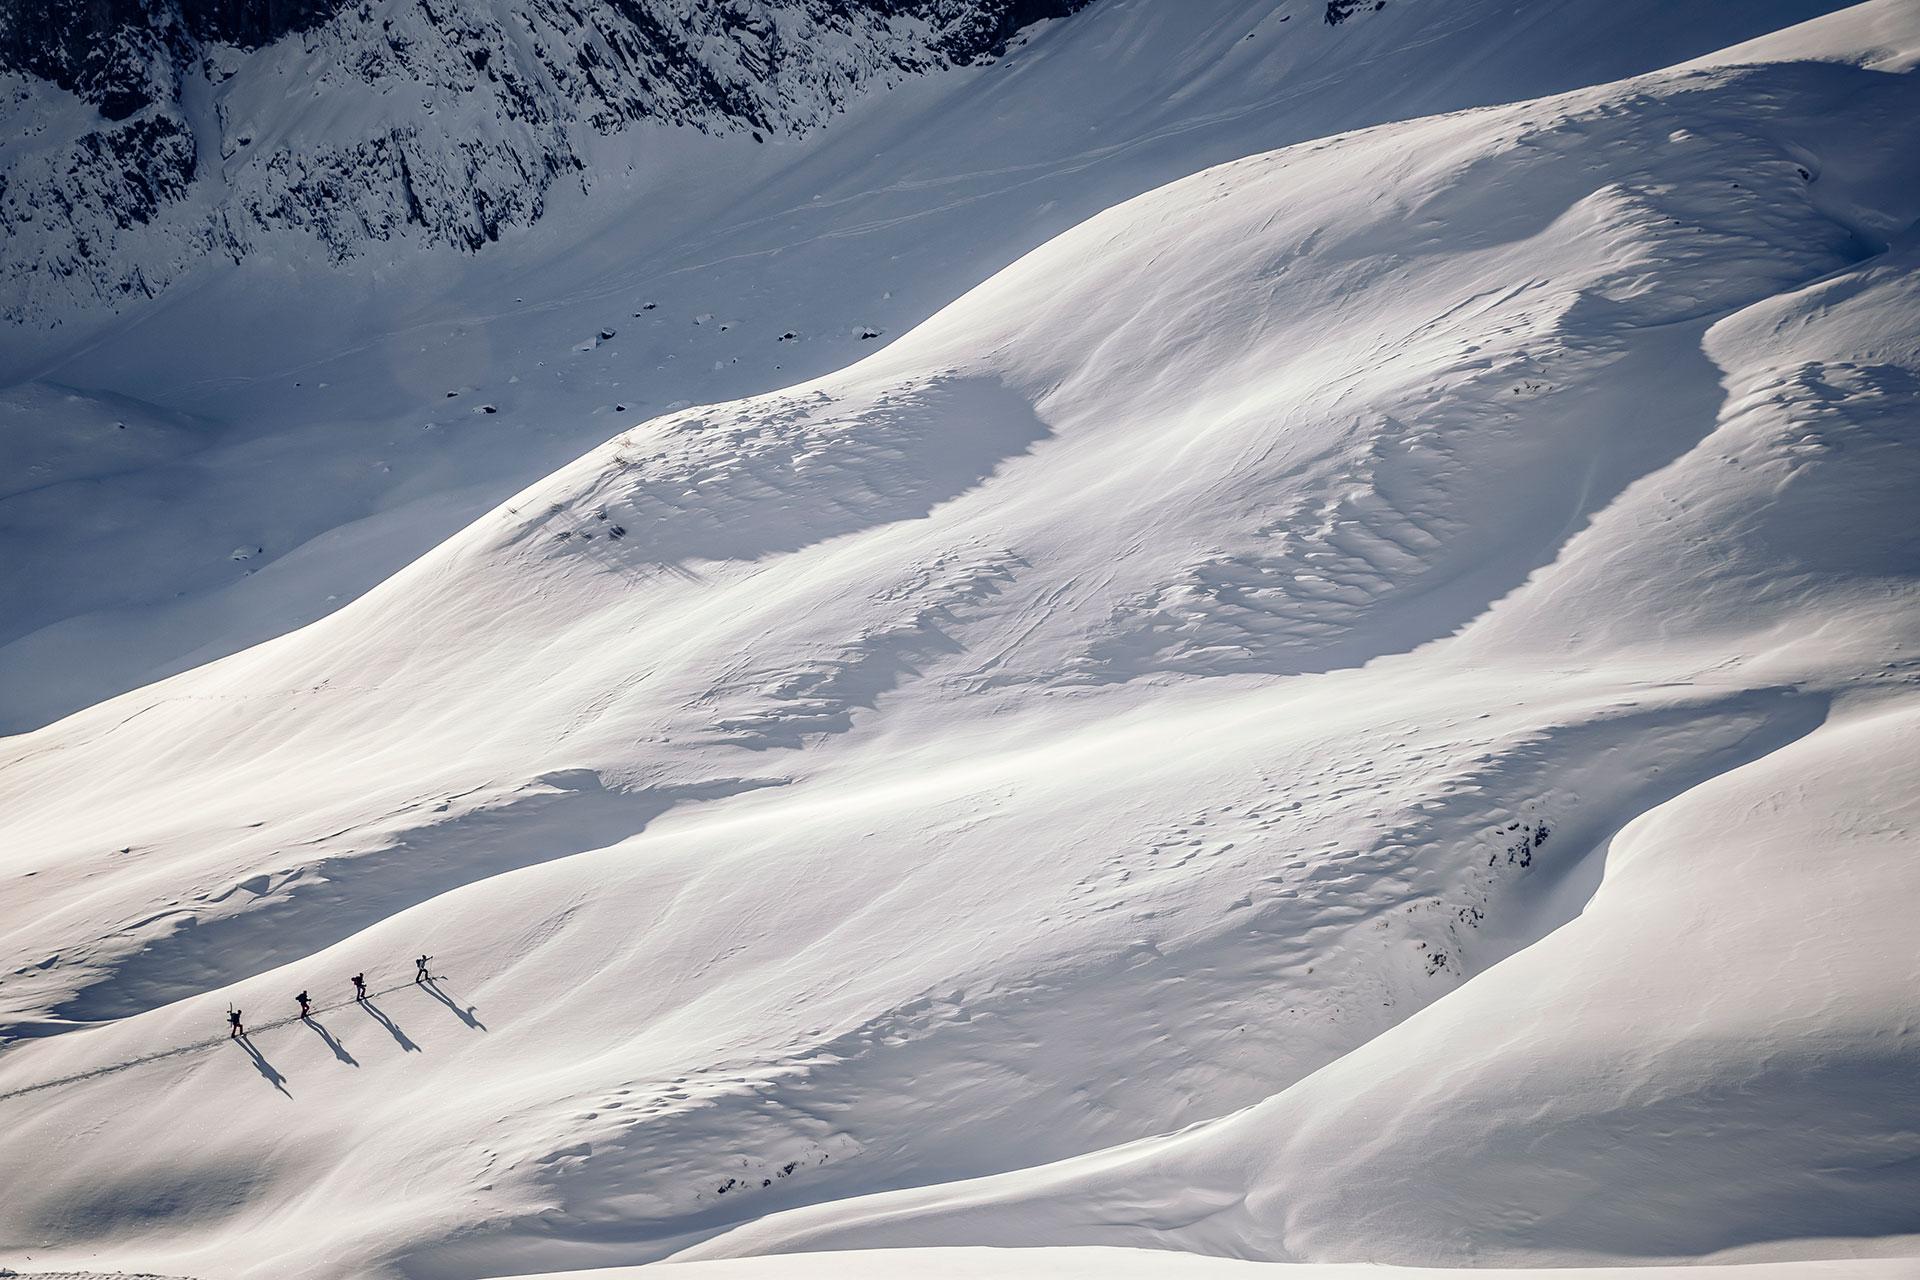 Ski Freeride Fotograf Snowboard Outdoor Berge Alpen Tirol Österreich Michael Müller